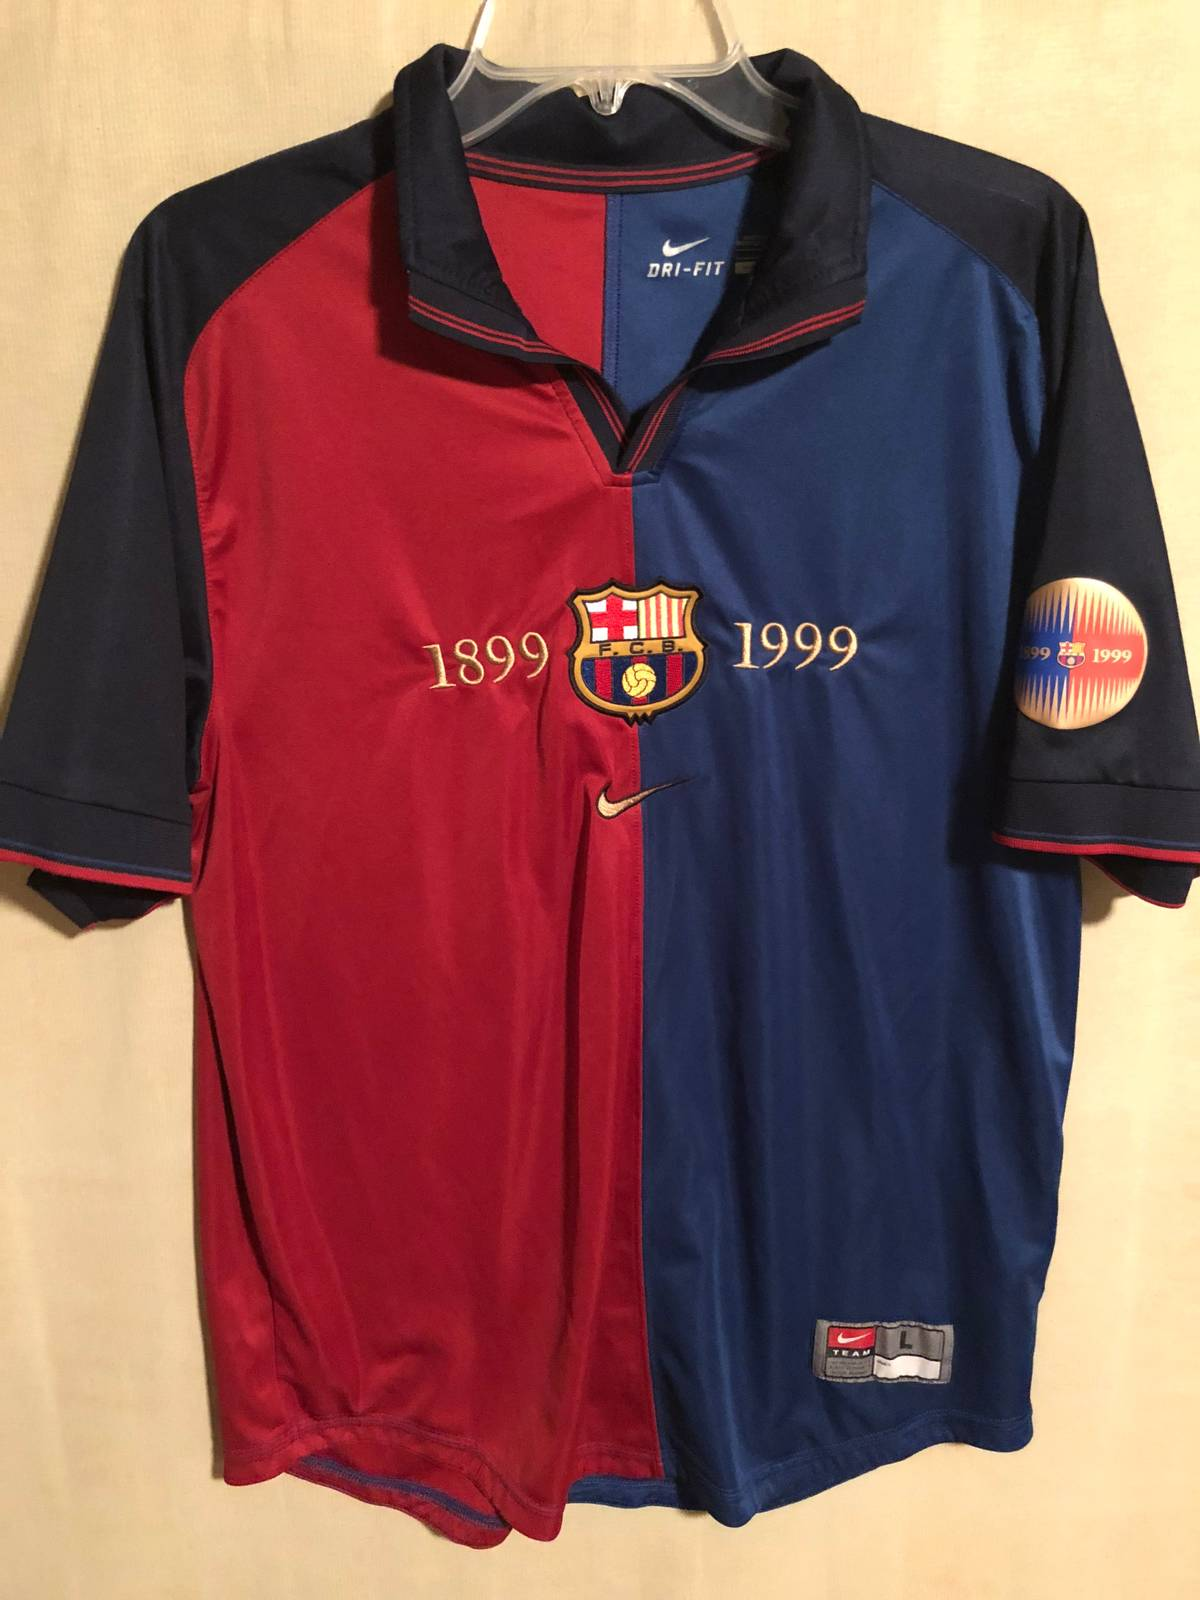 3a97c2dc4 F.c. Barcelona Barcelona 1999-2000 Retro 100 Year Anniversary Jersey ...